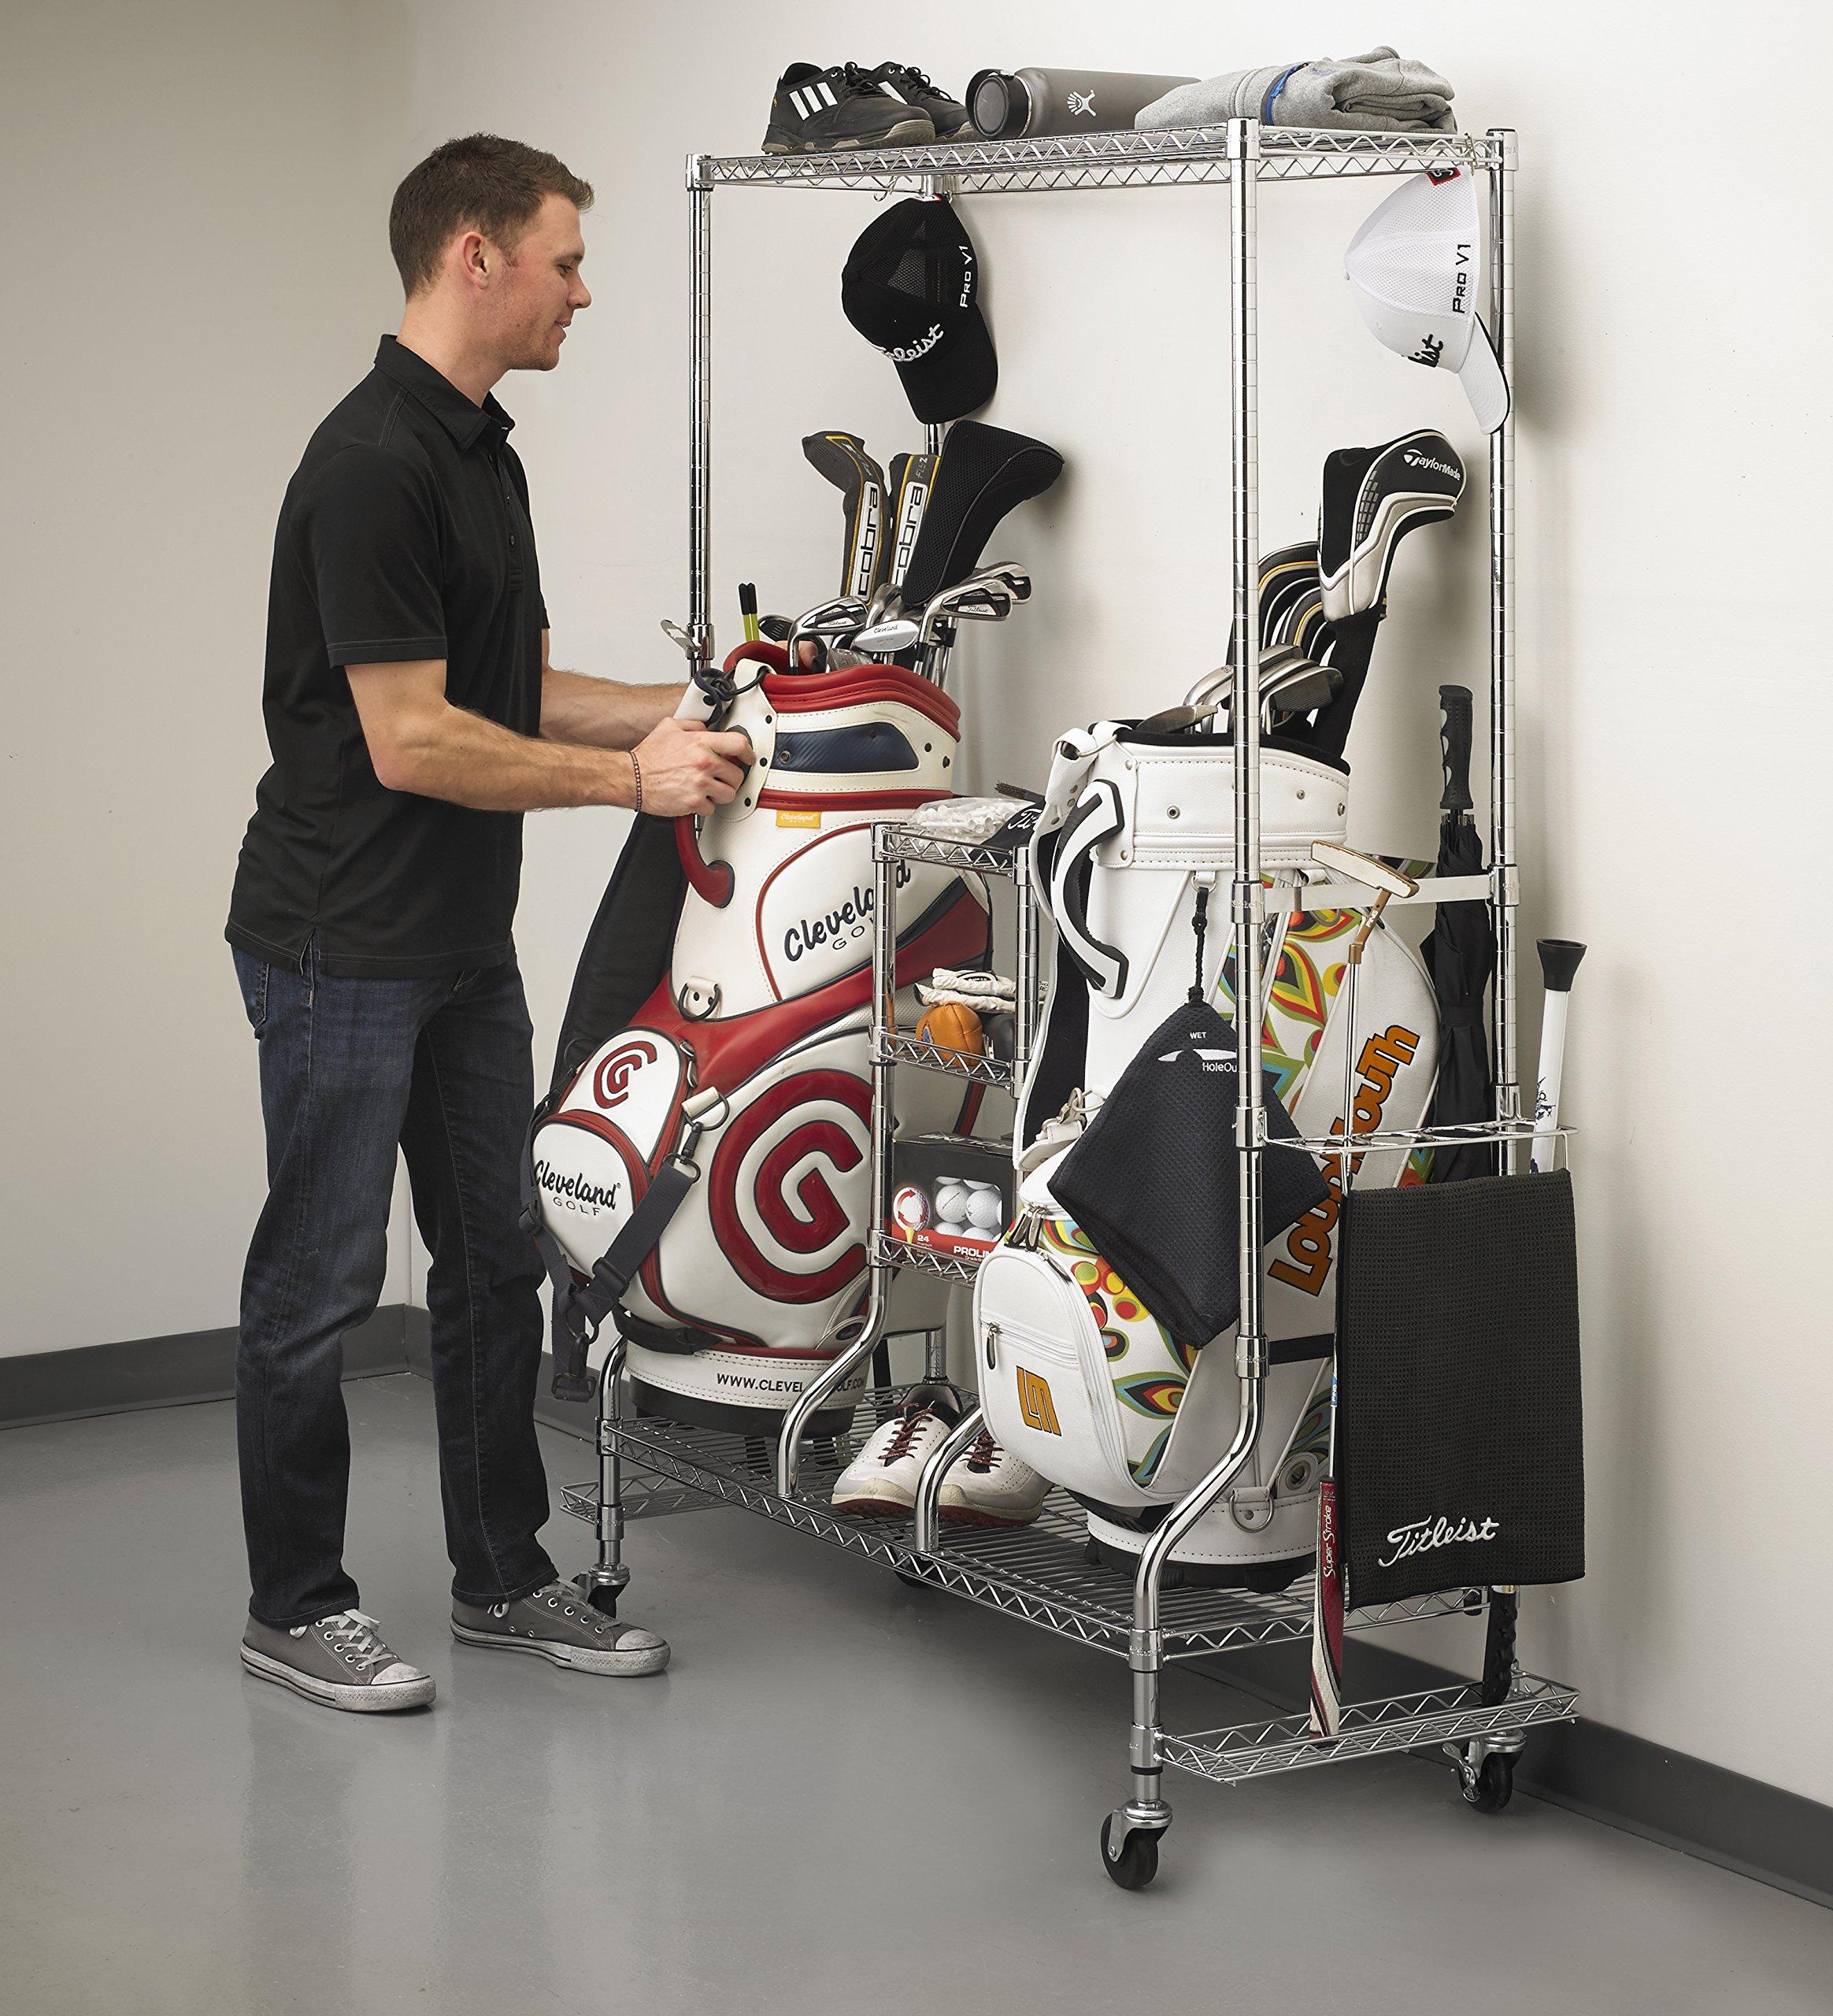 SafeRacks - Golf Equipment Organizer